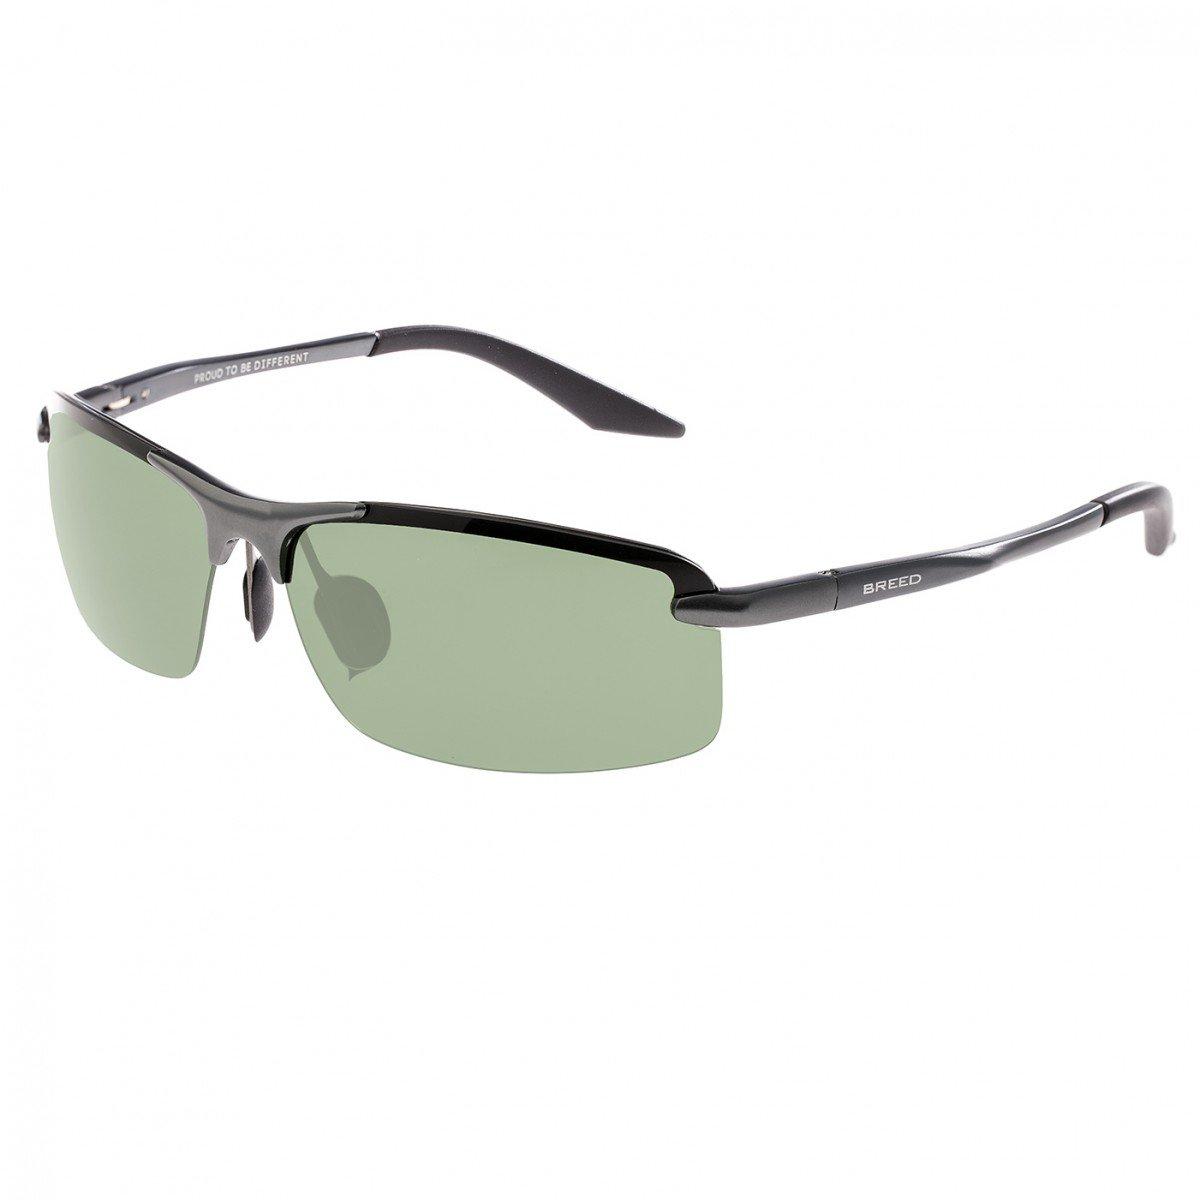 7de79eac82 Amazon.com  Breed Lynx Aluminium Sunglasses - Black Silver  Shoes